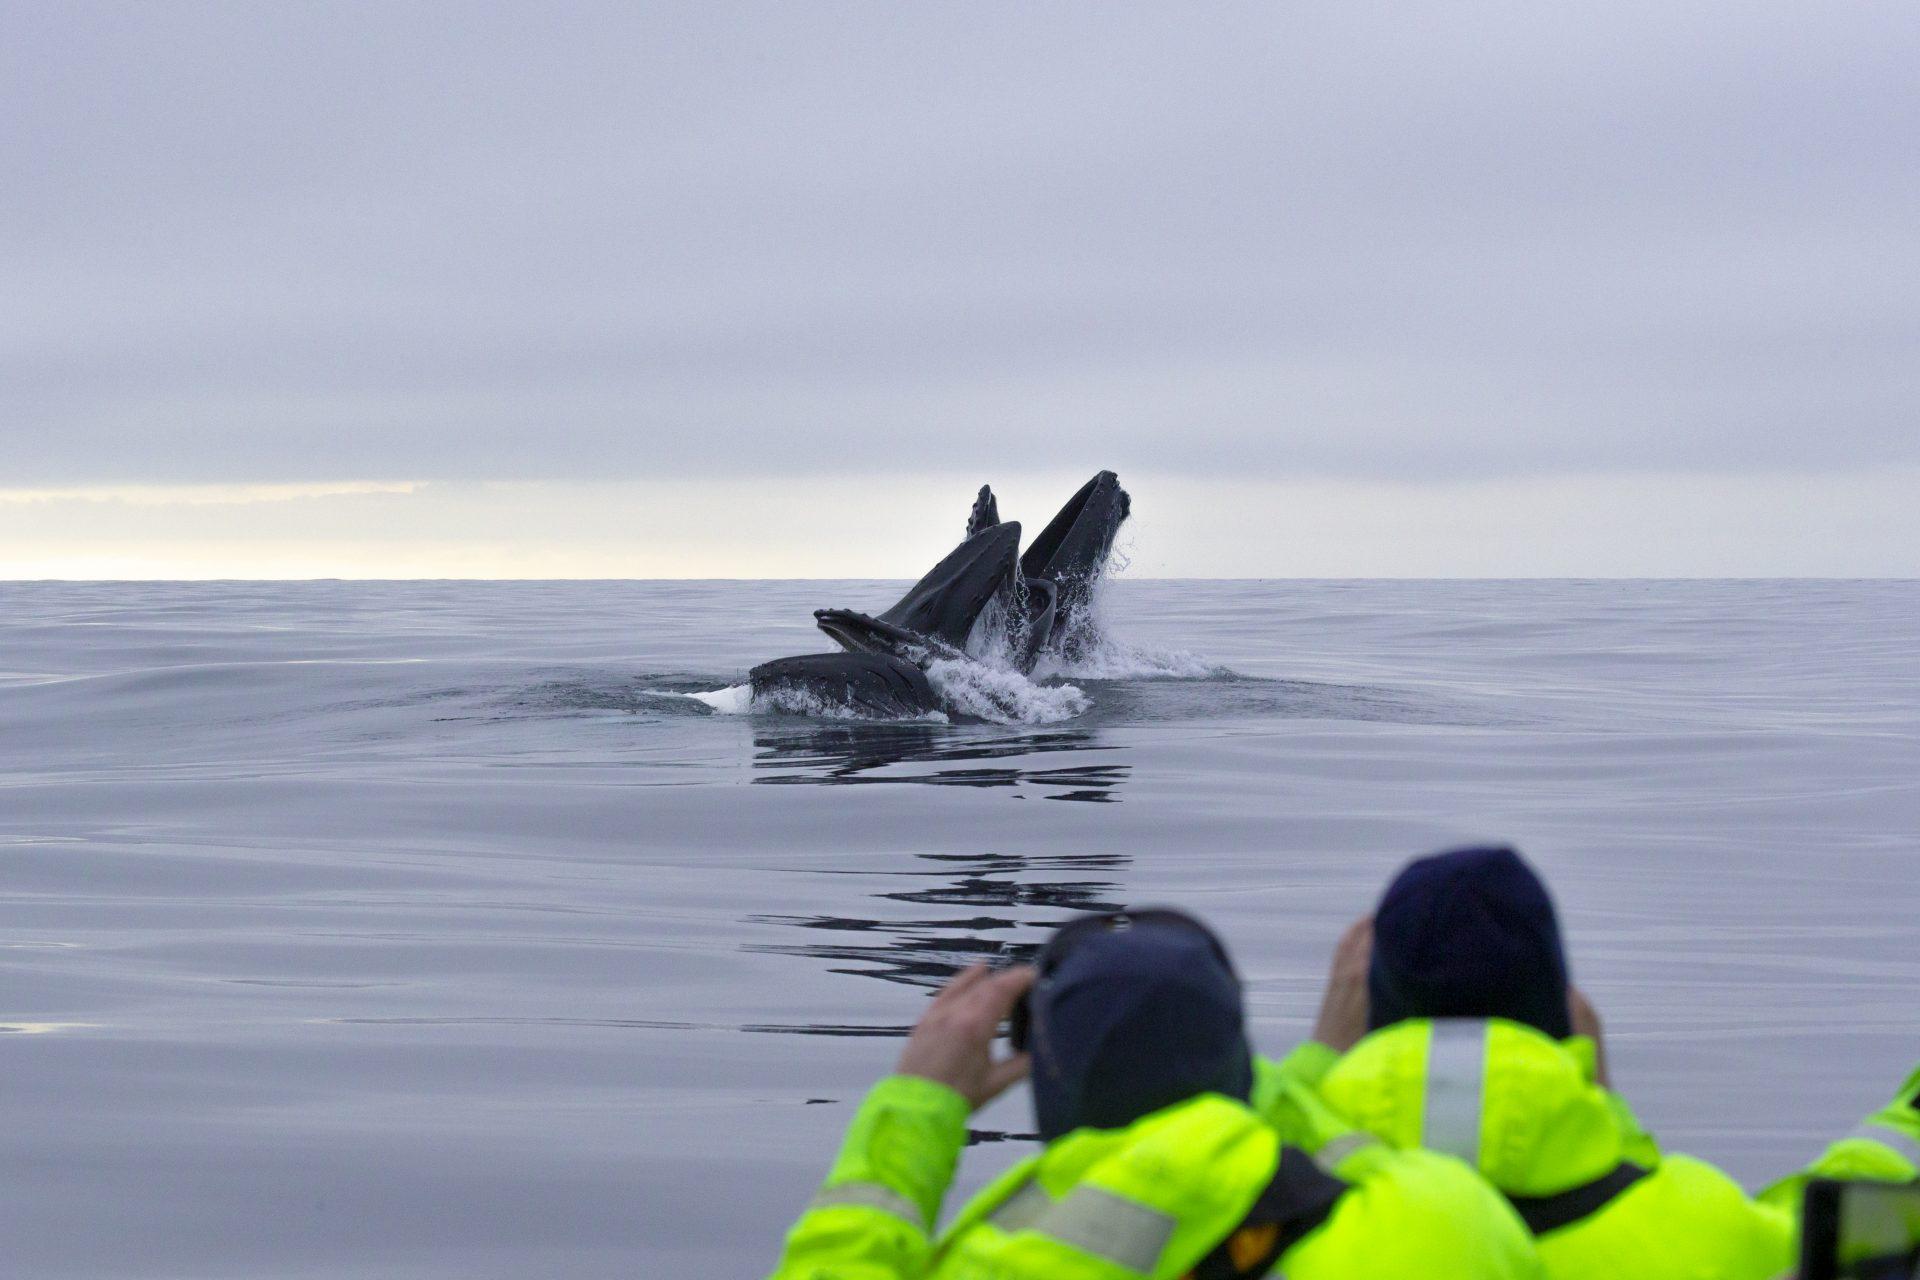 Observing Humpbacks Whales & Orcas Natural High